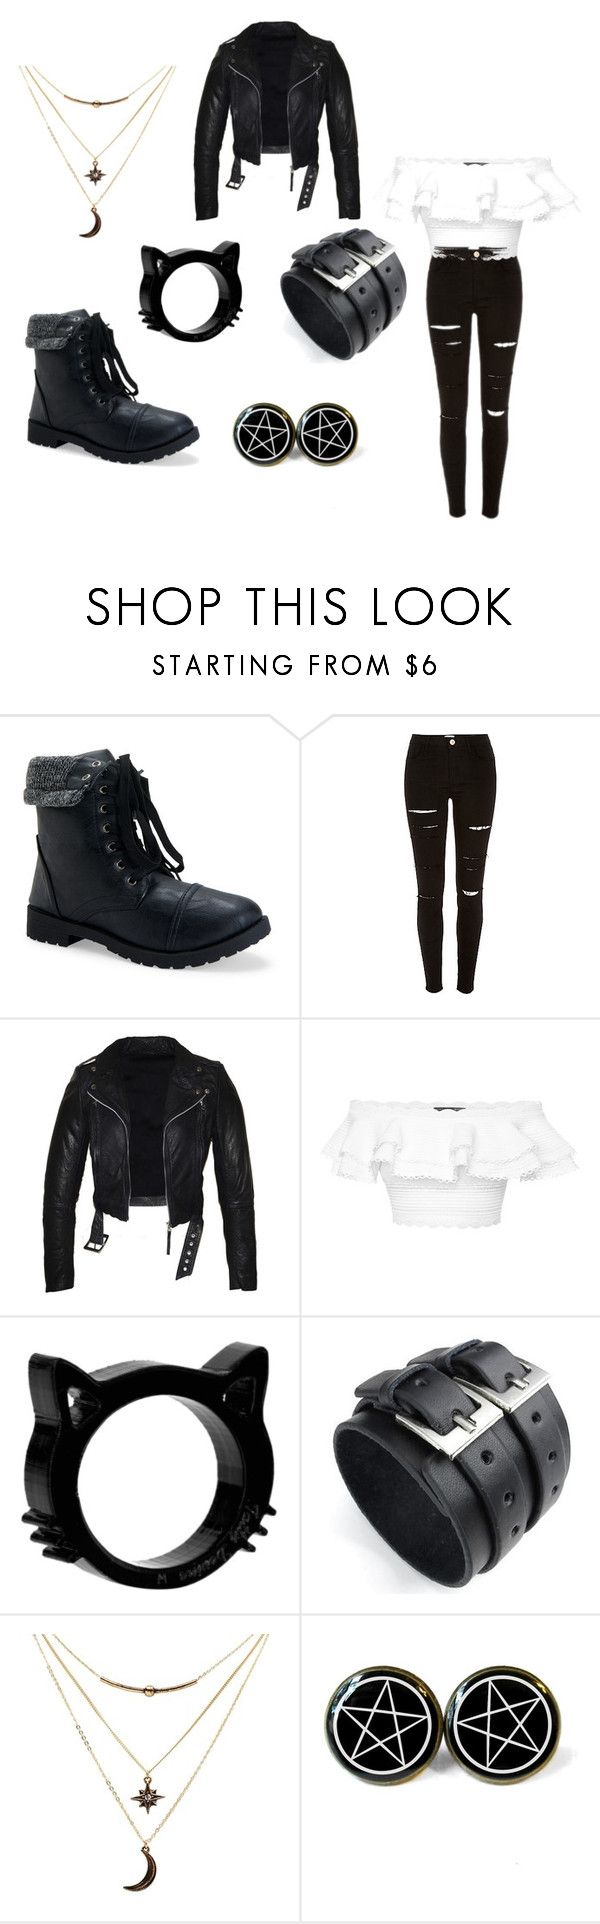 52 mejores imágenes de clothes en Pinterest | Zapatos, Abuso ...